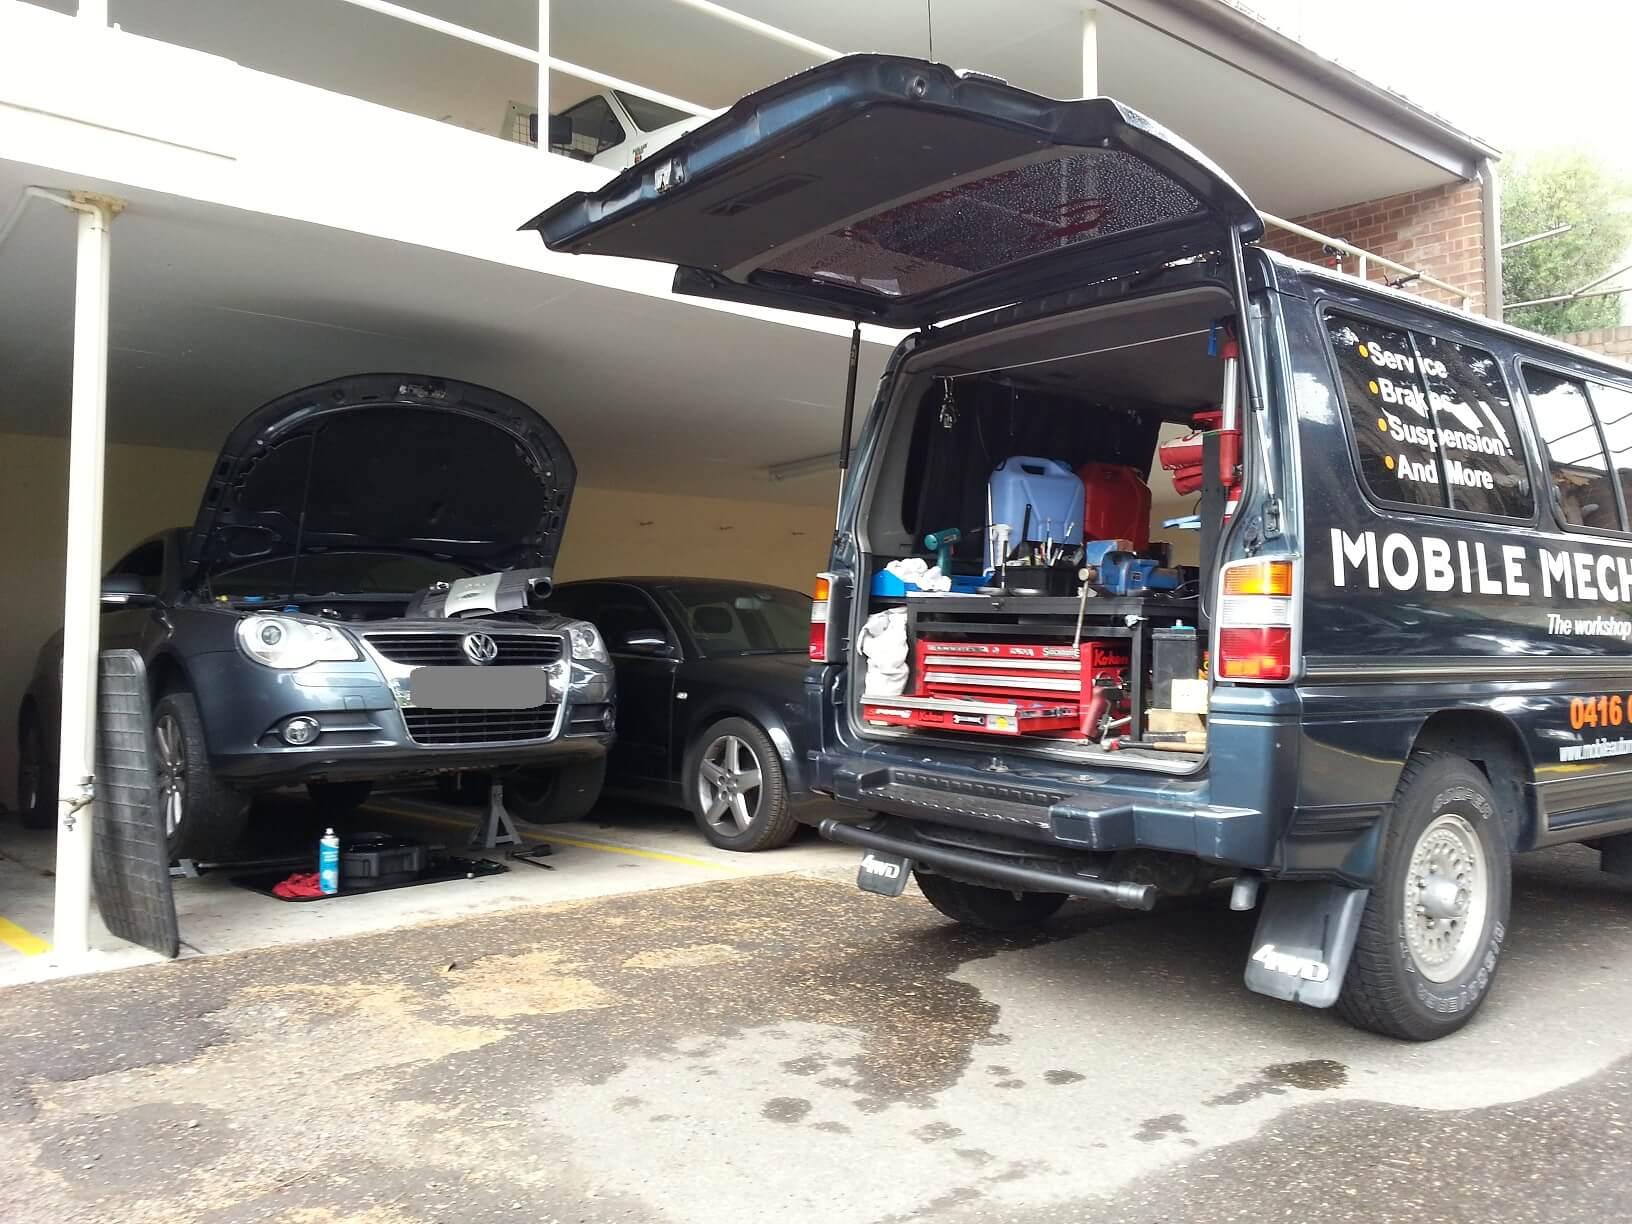 Mobile Mechanic Atlanta Ga 404 948